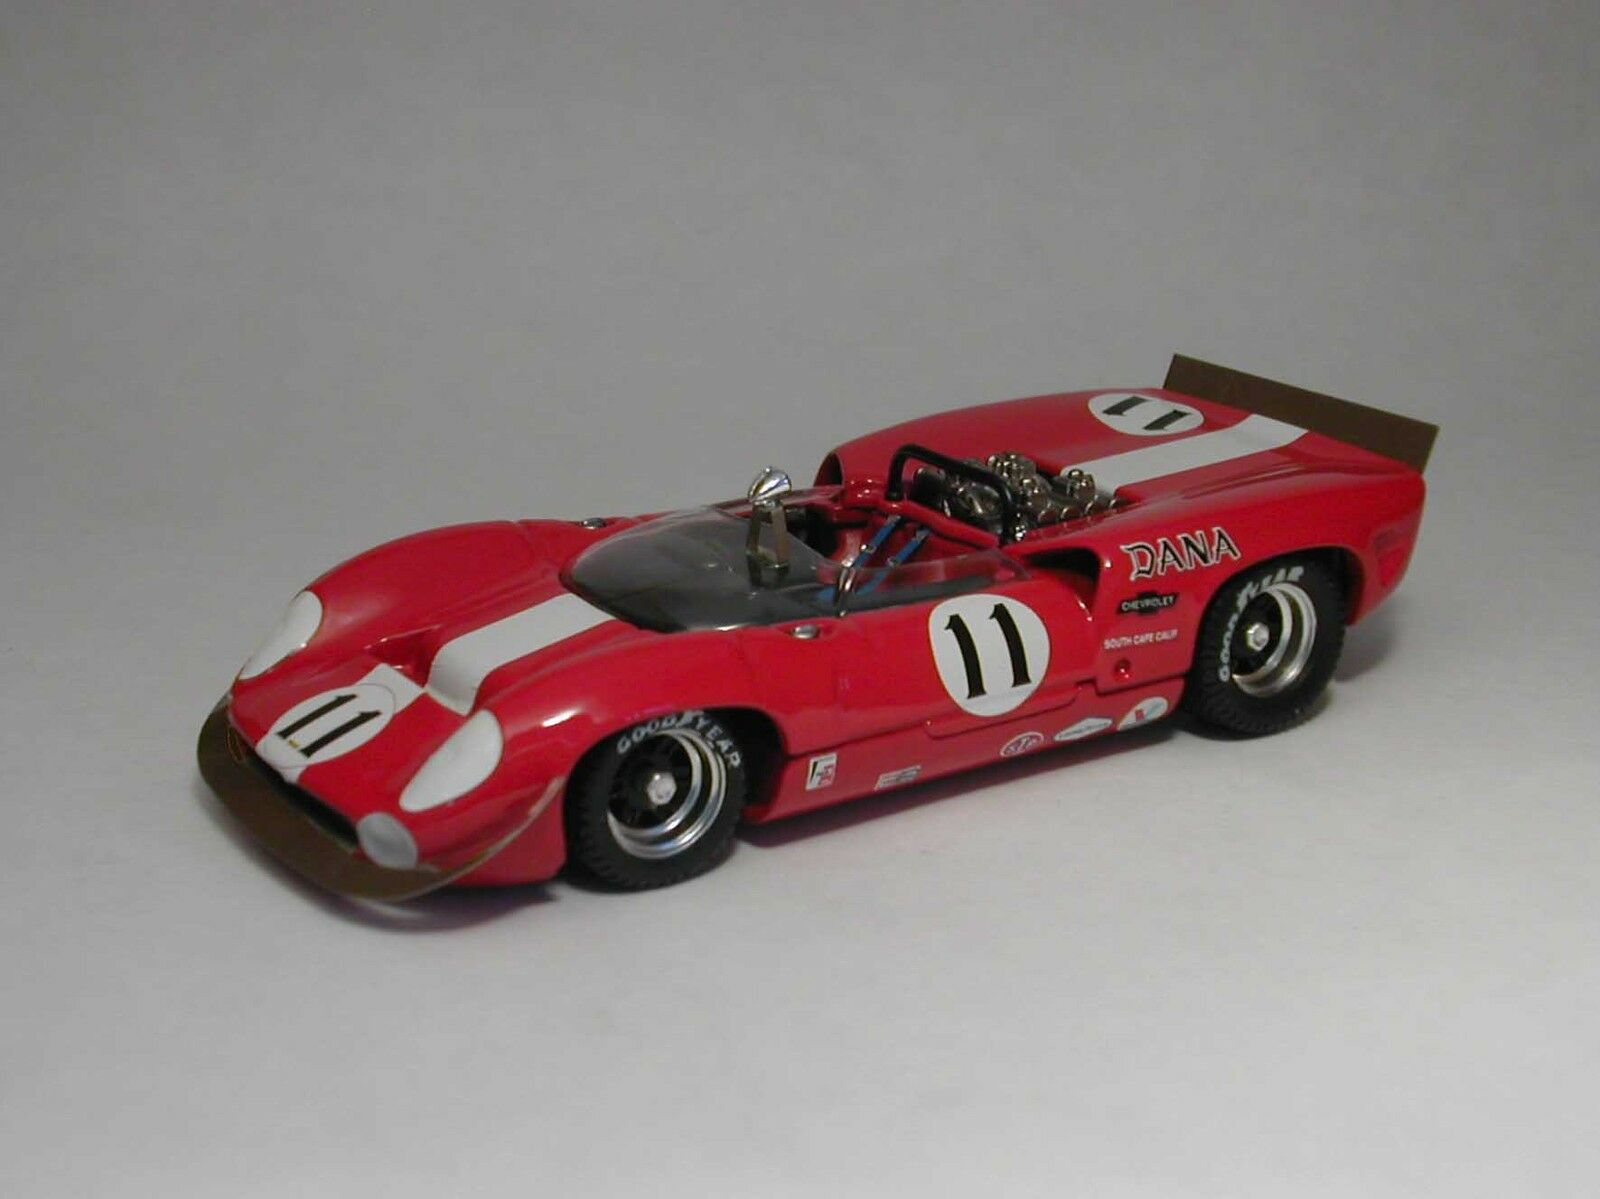 Lola t70 Spyder  11 à la retraite Can-Am Laguna Seca 1967 L Motschenbacher 1 43 MODEL